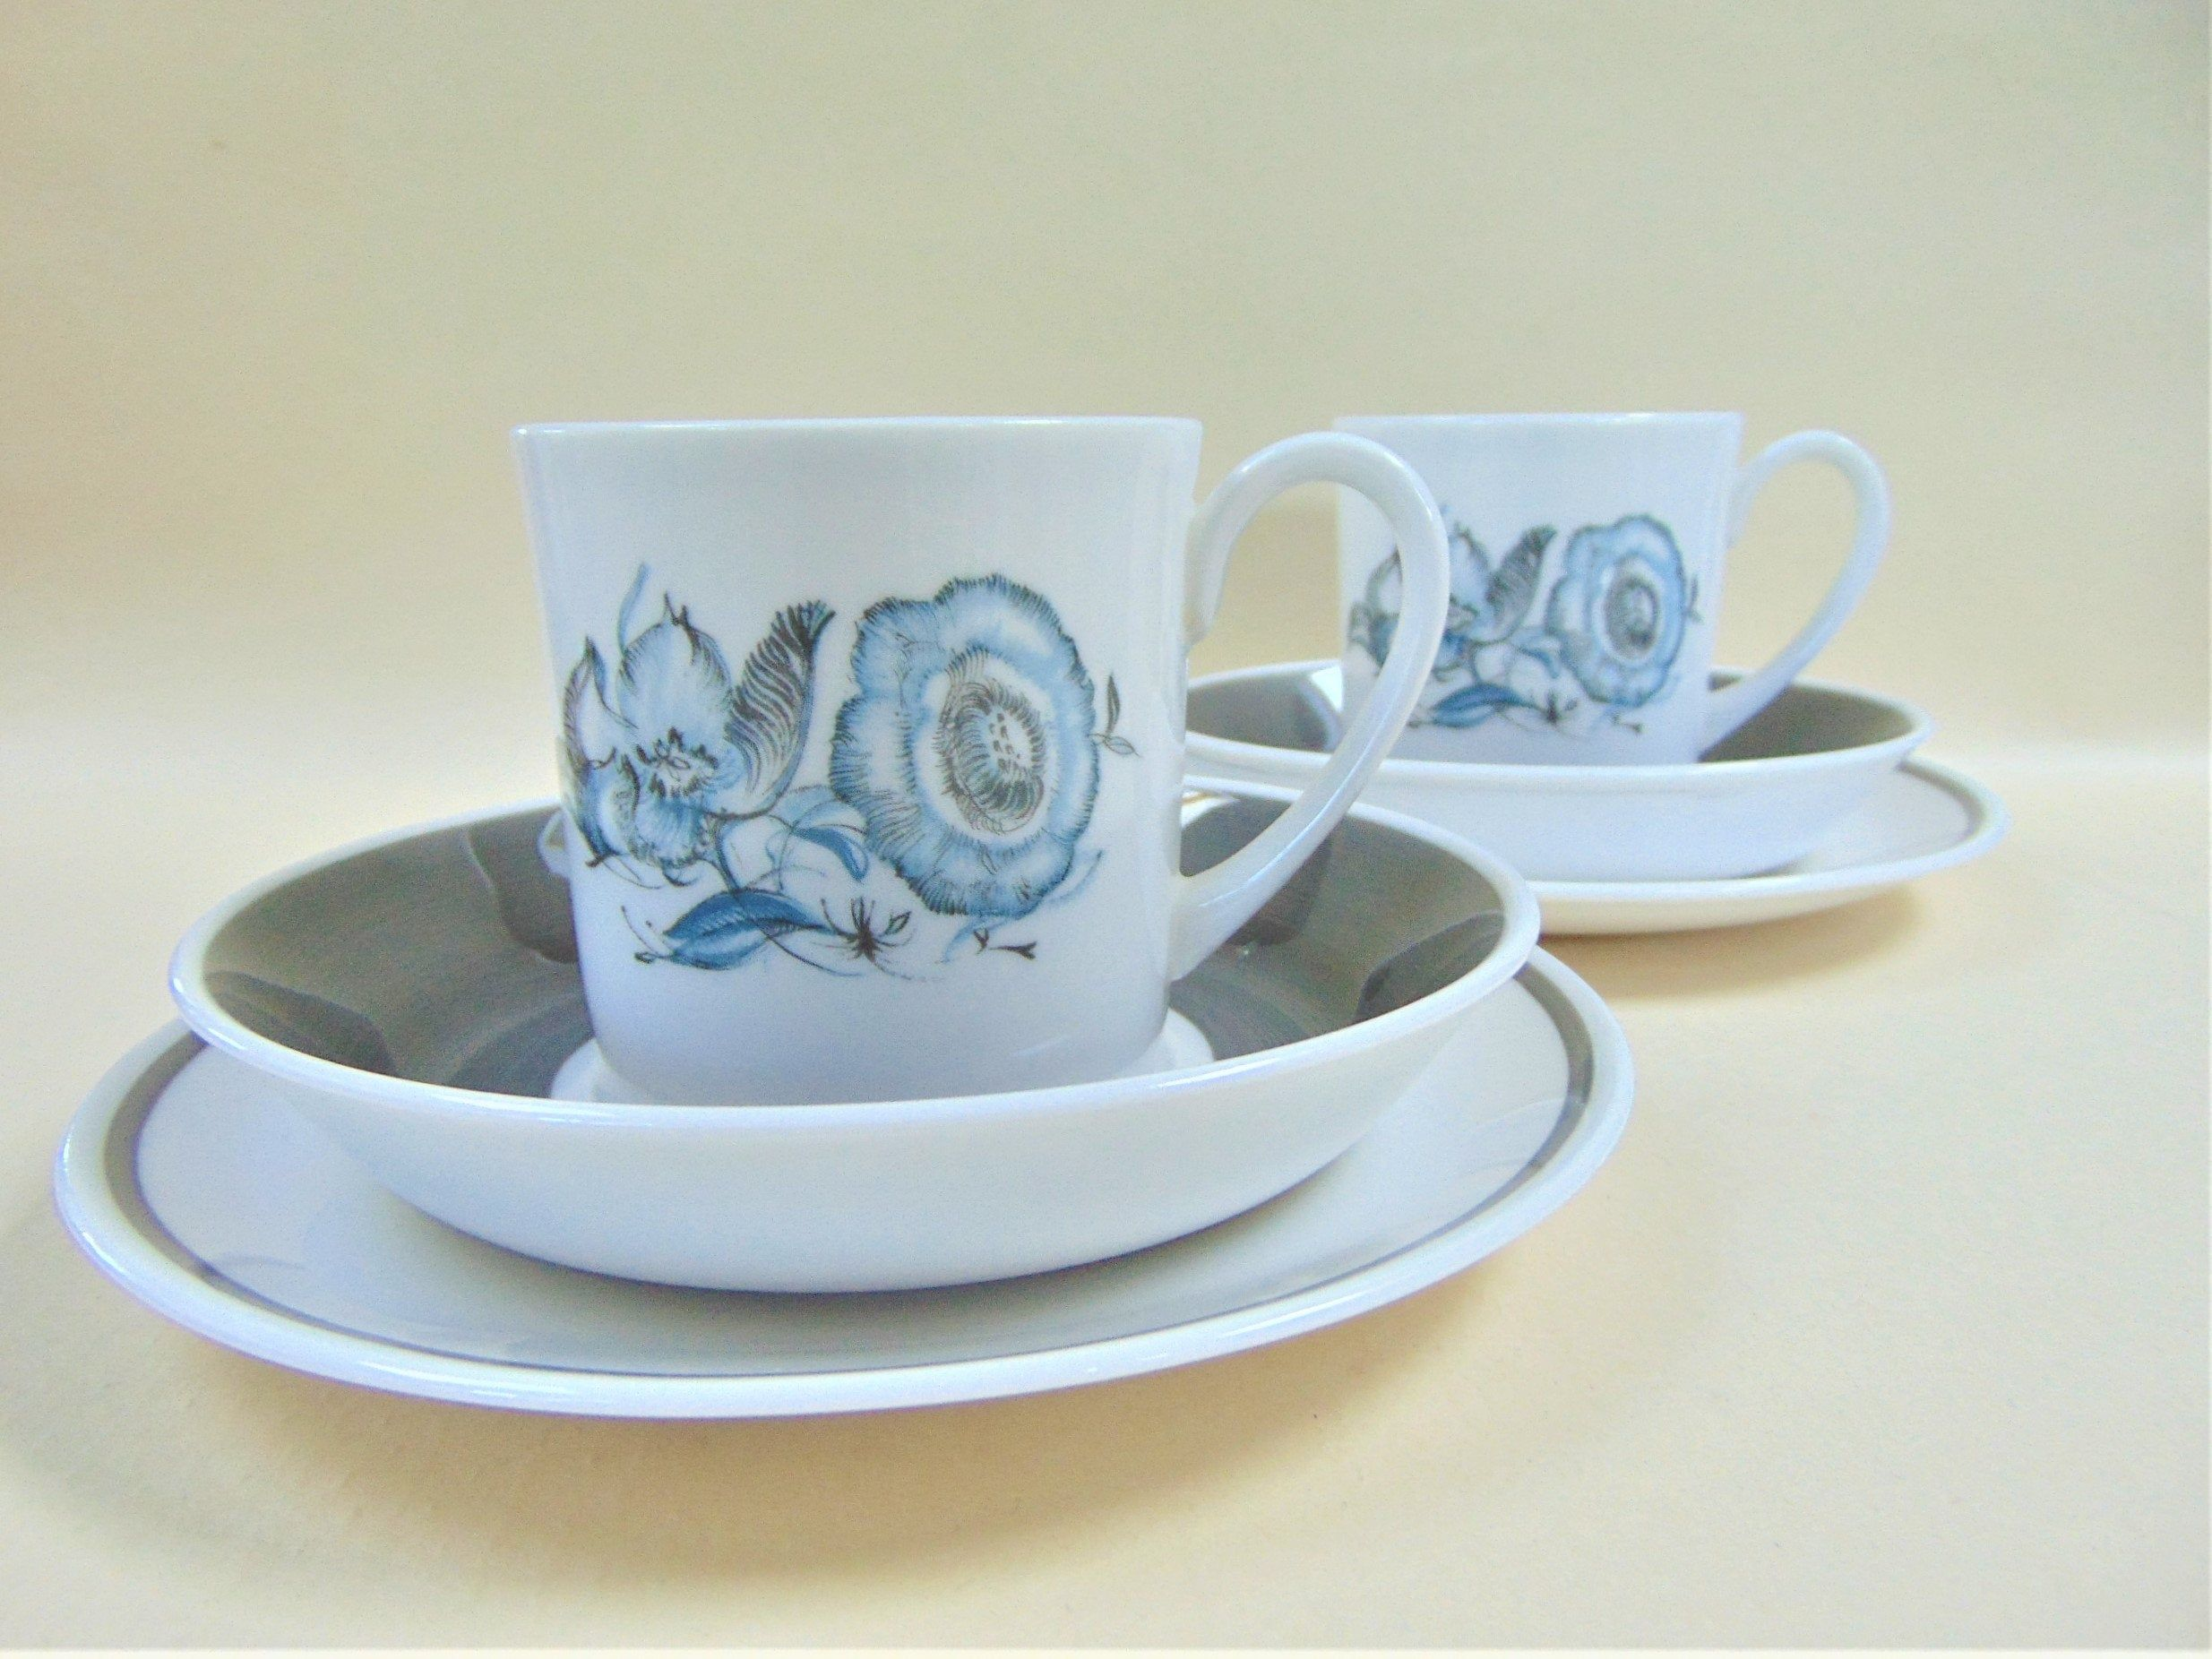 Susie Cooper Blue Peony Flat Cup Saucer and Tea Plate Trio Vintage Bone China Coffee Tea Serving #bluepeonies